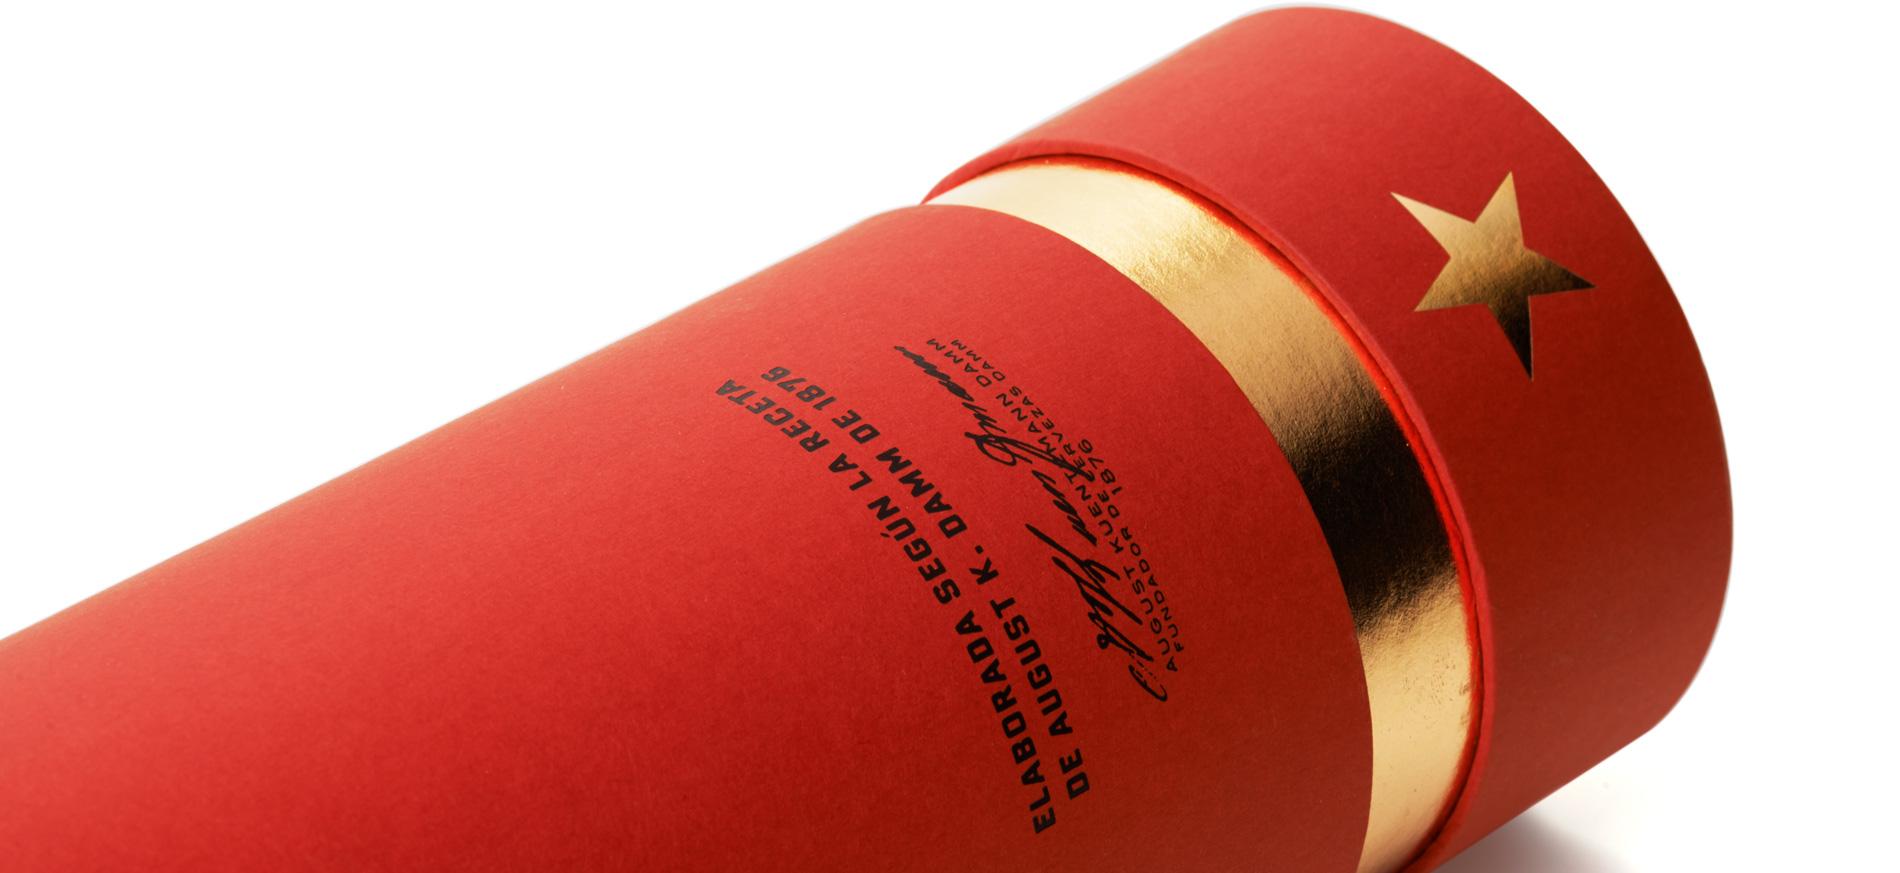 Diseño de Packaging de Caja Estrella Damm 66cl de Grupo Damm por Puigdemont Roca Design Agency